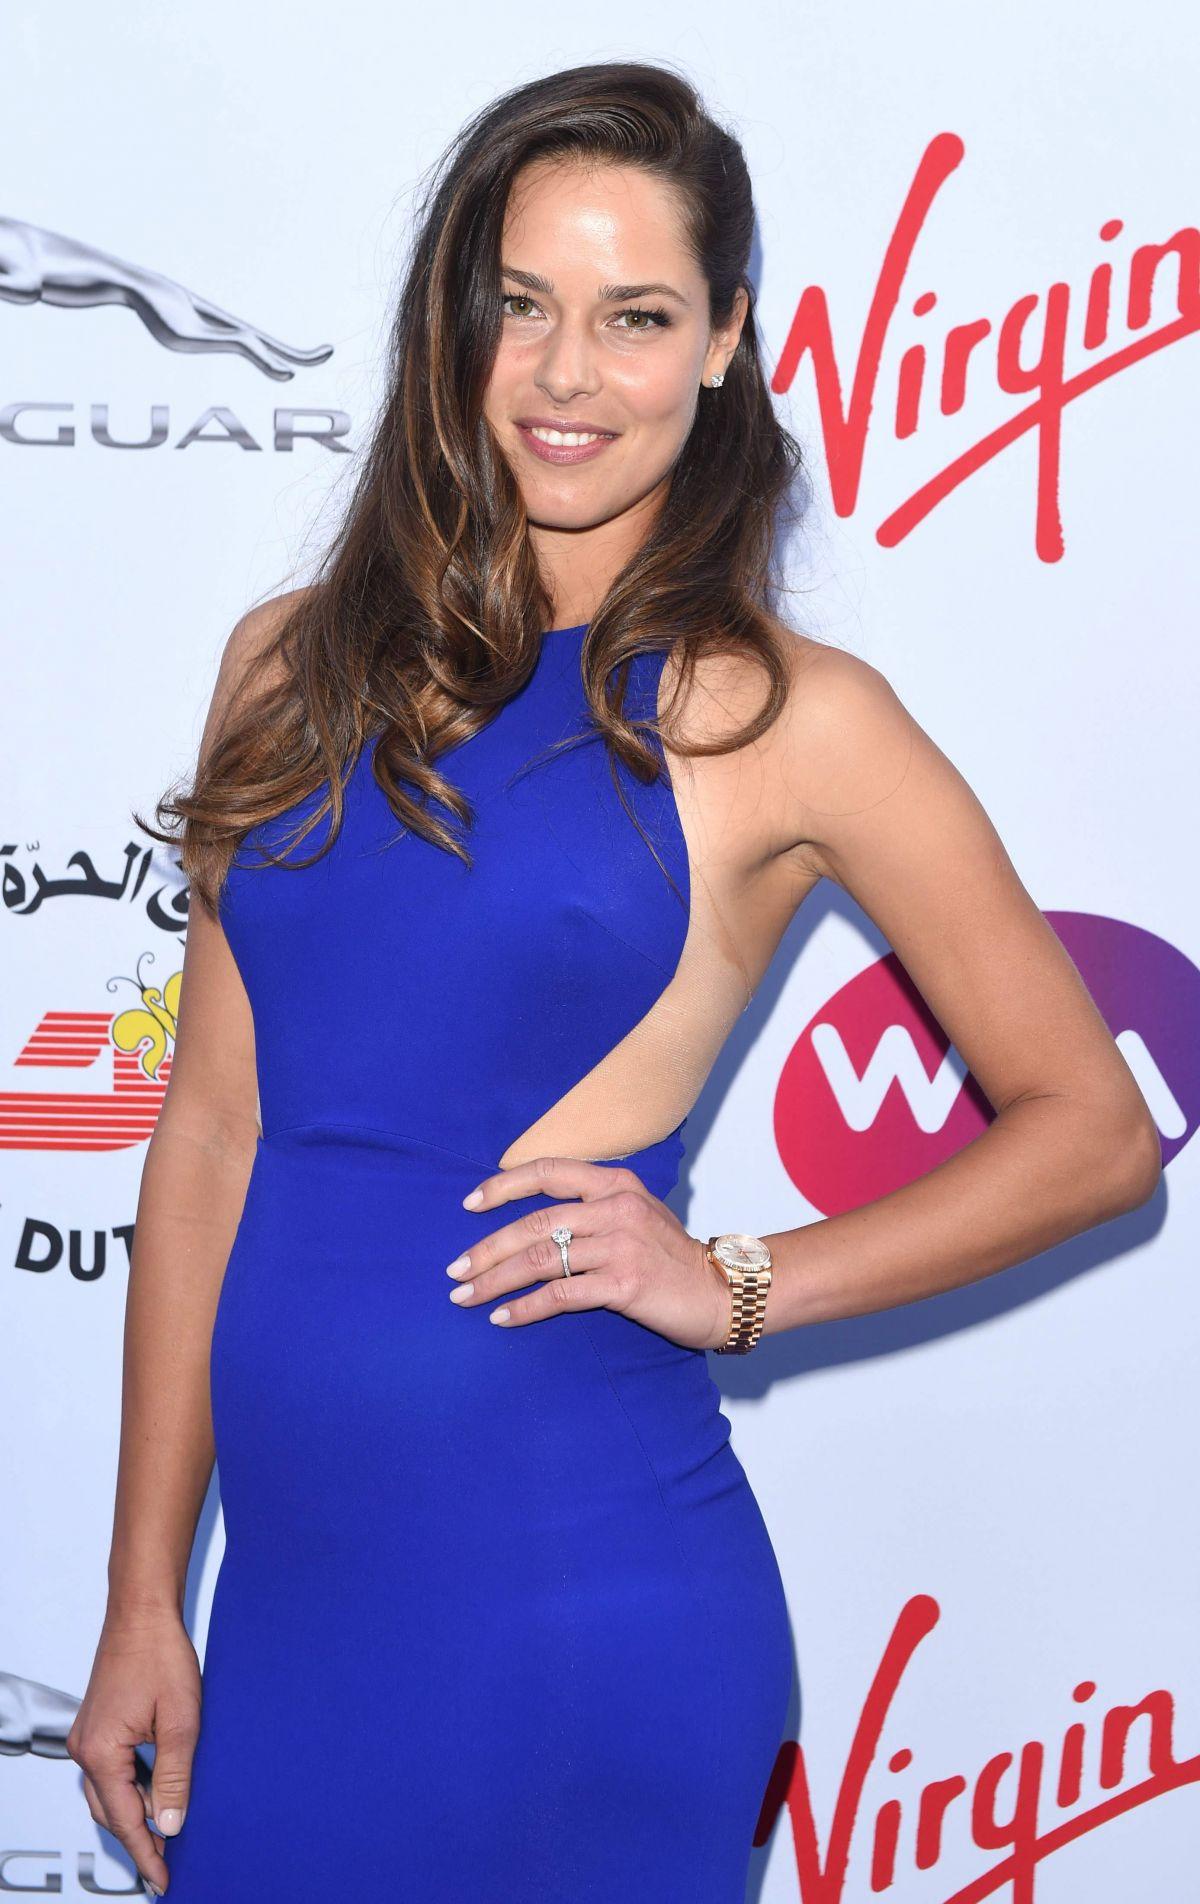 ANA IVANOVIC at WTA Pre-Wimbledon Party in London